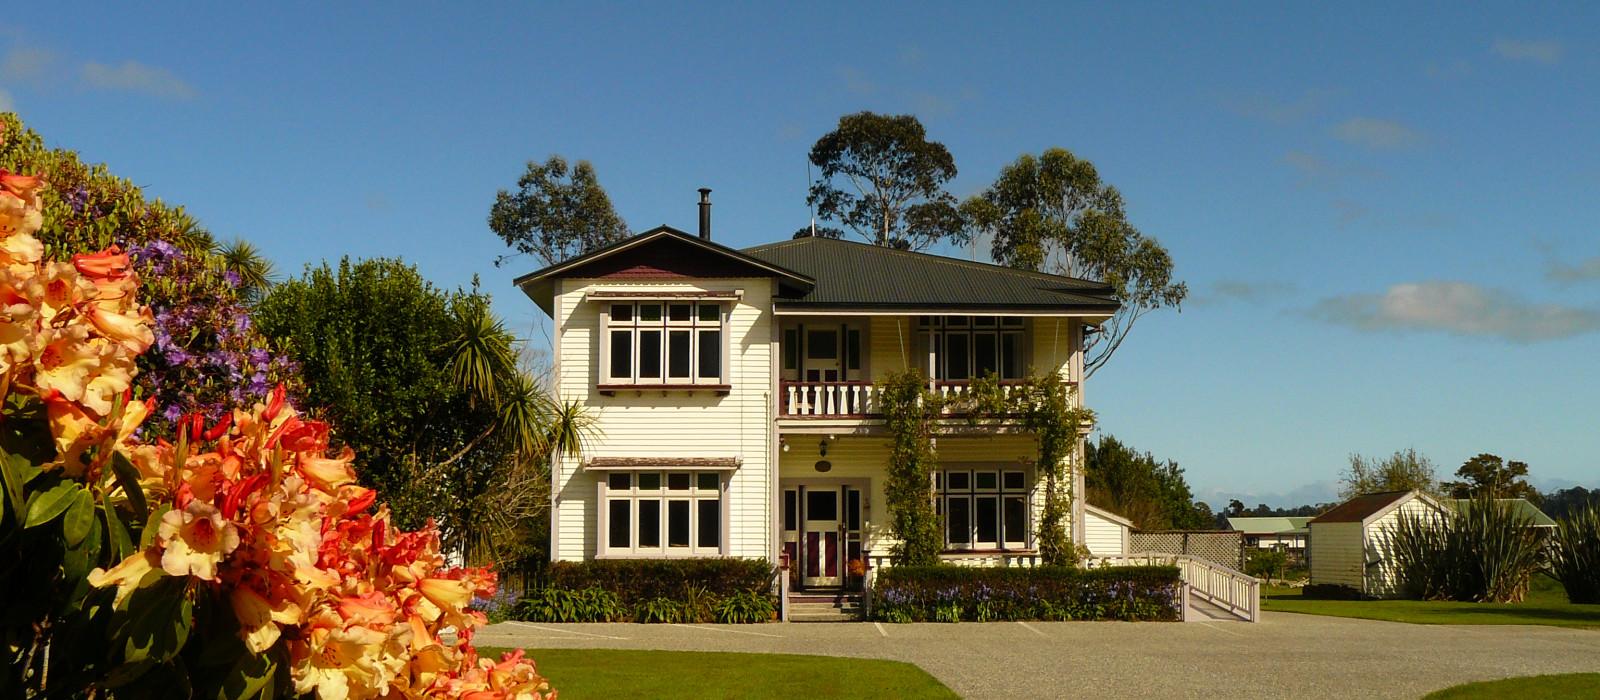 Hotel Holly Homestead (B & B) New Zealand